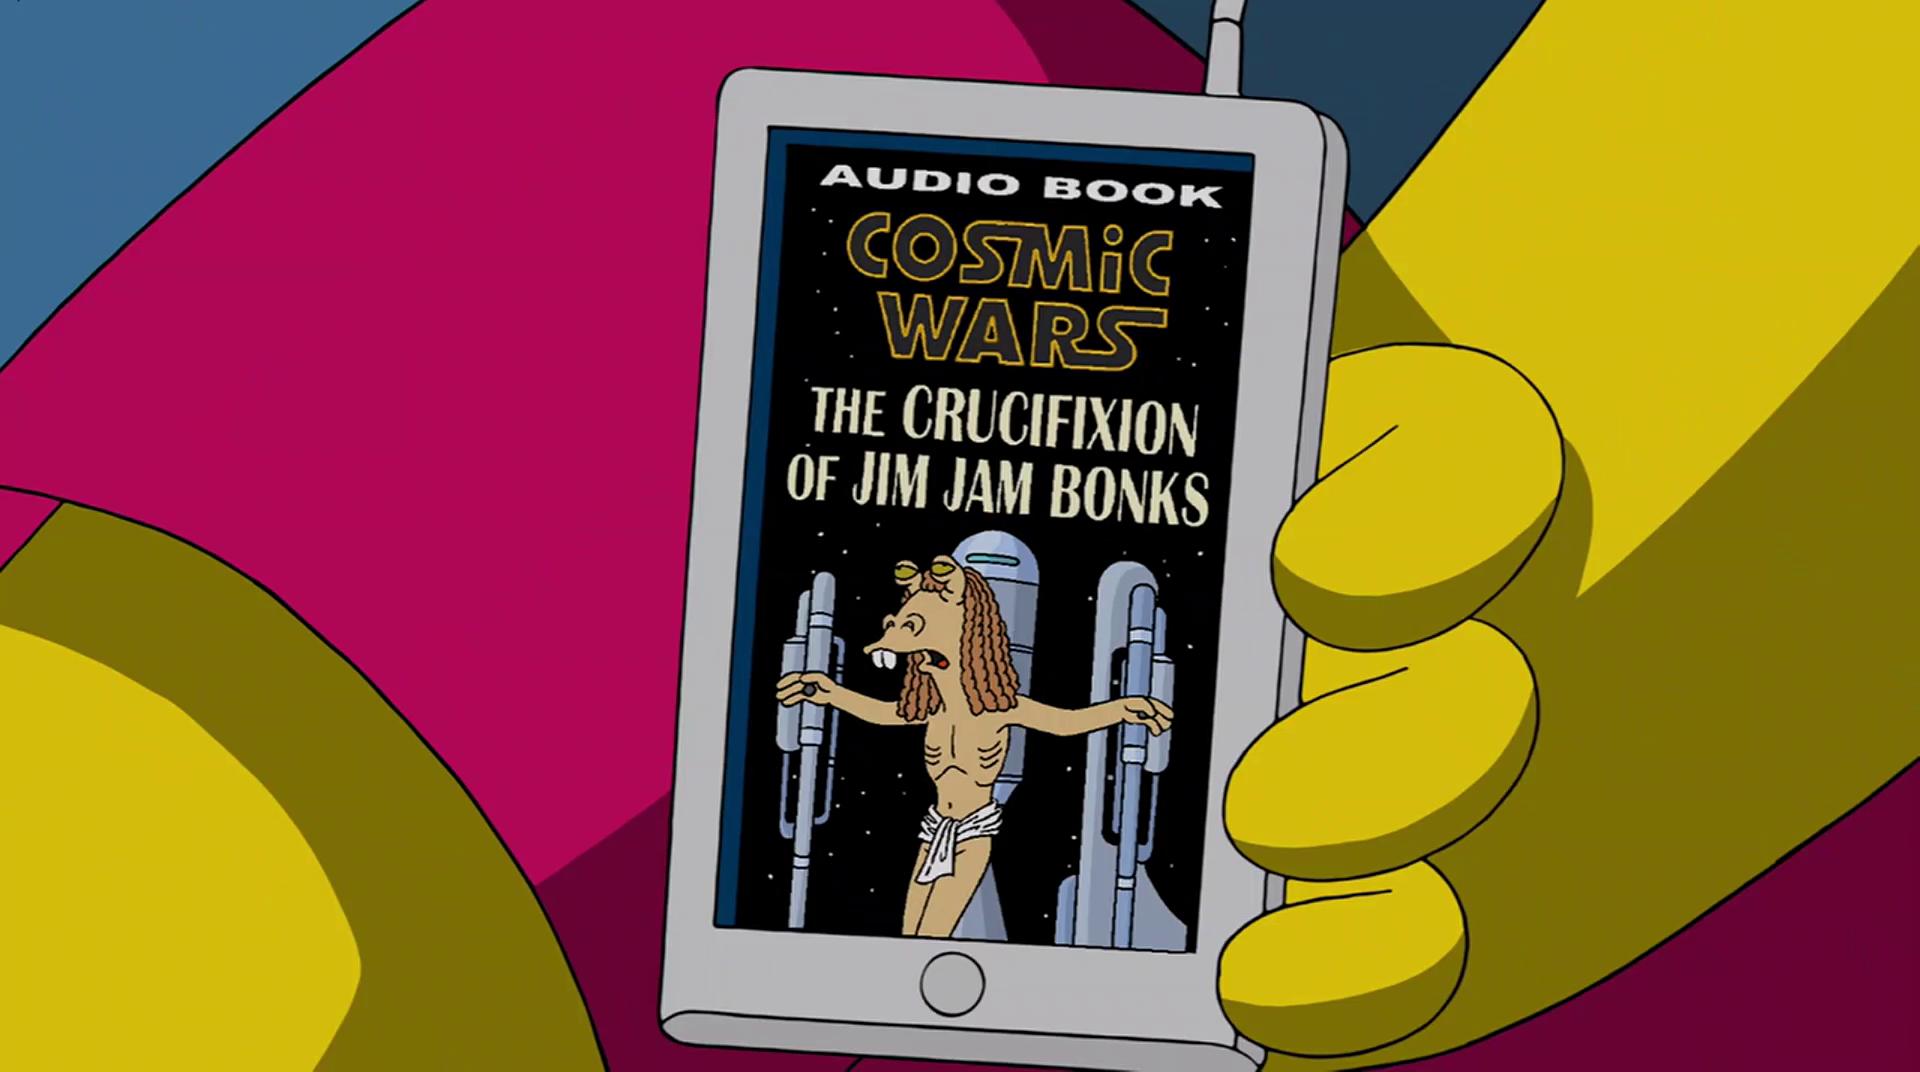 Cosmic Wars The Crucifixion of Jim Jam Bonks.png